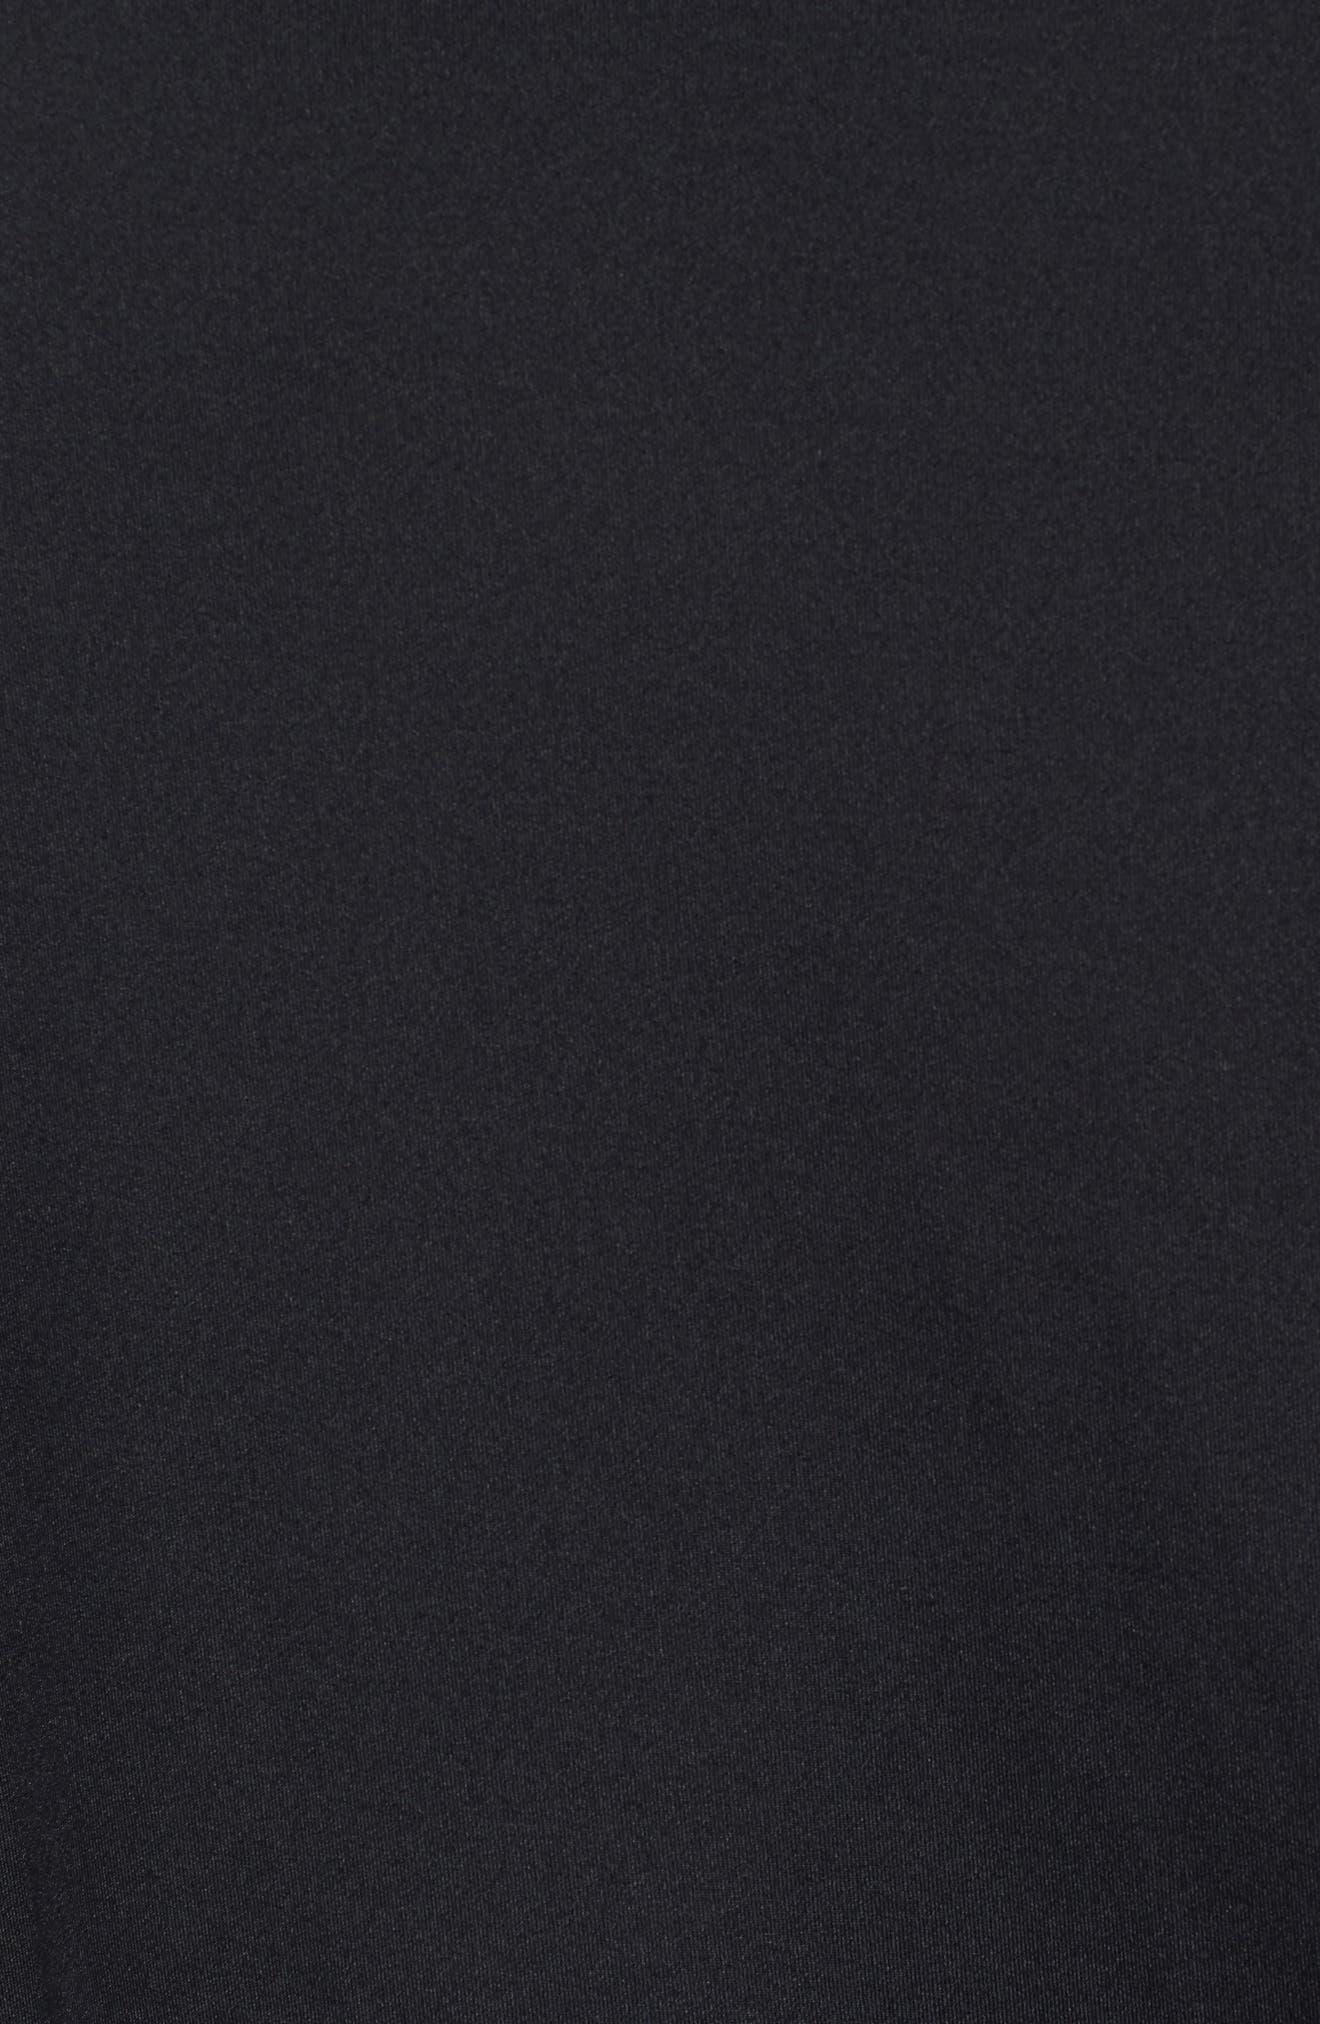 Pro Fitted T-Shirt,                             Alternate thumbnail 5, color,                             Black/White/White